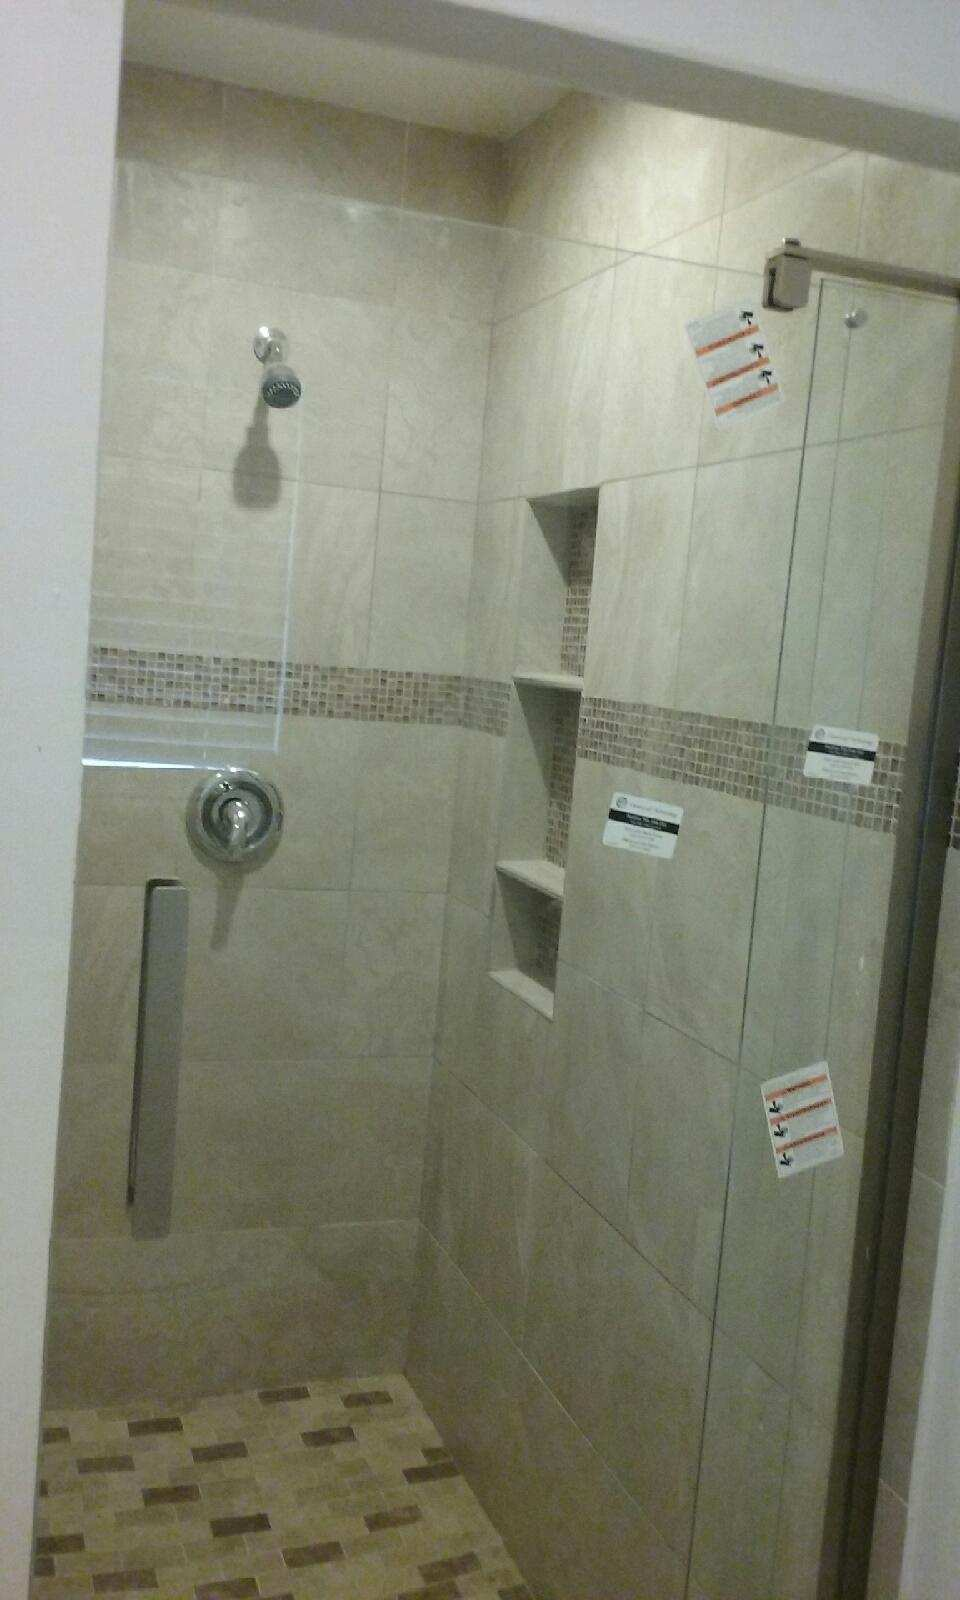 Bath Remodeling, Shower, Tile, Plumbing